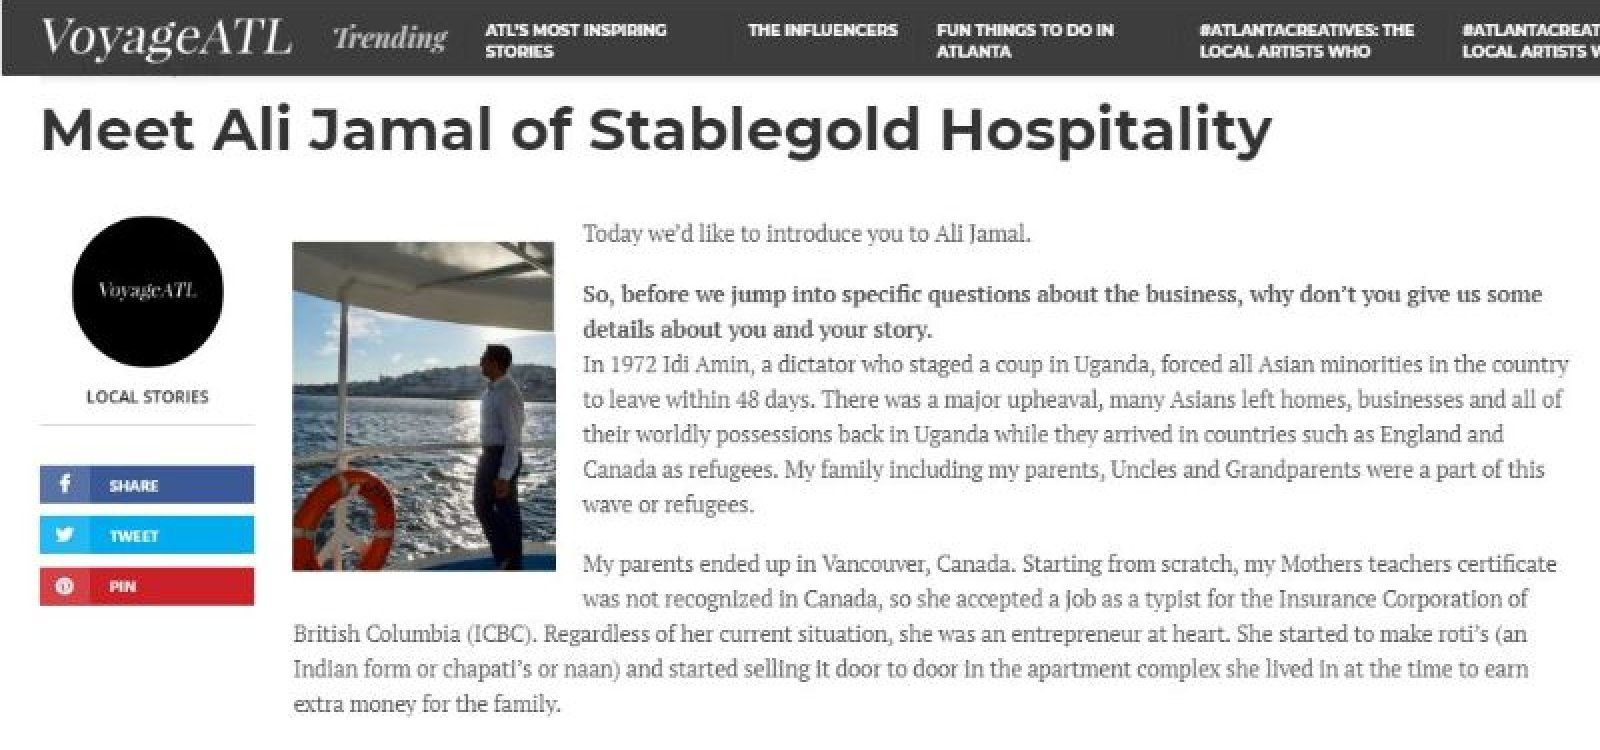 Meet Ali Jamal of Stablegold Hospitality